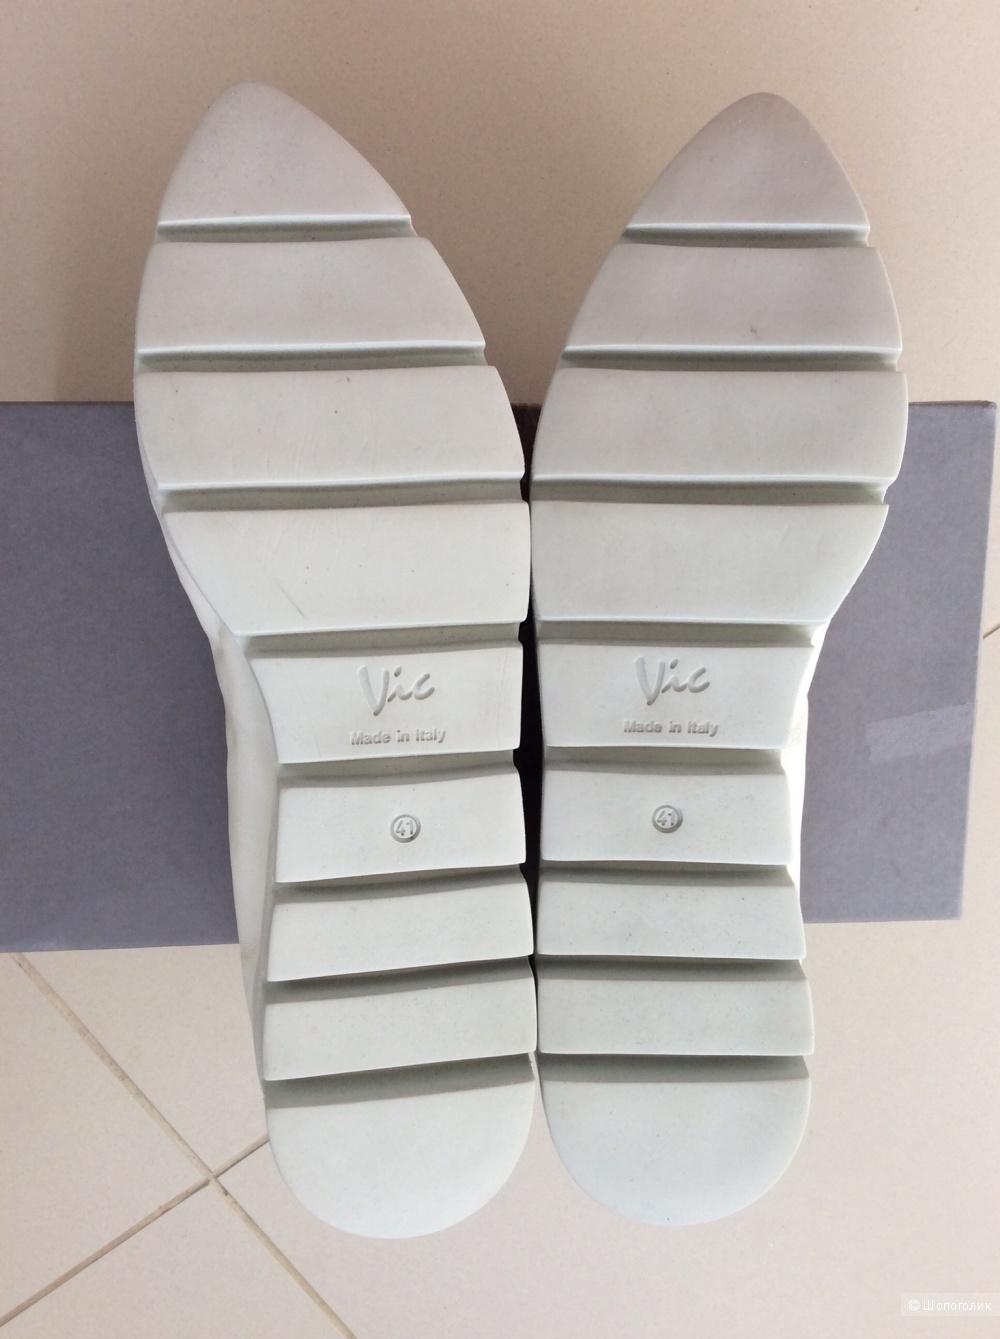 Туфли-балетки VIC р.41 (маломерки, на стопу 25,5-26 см)